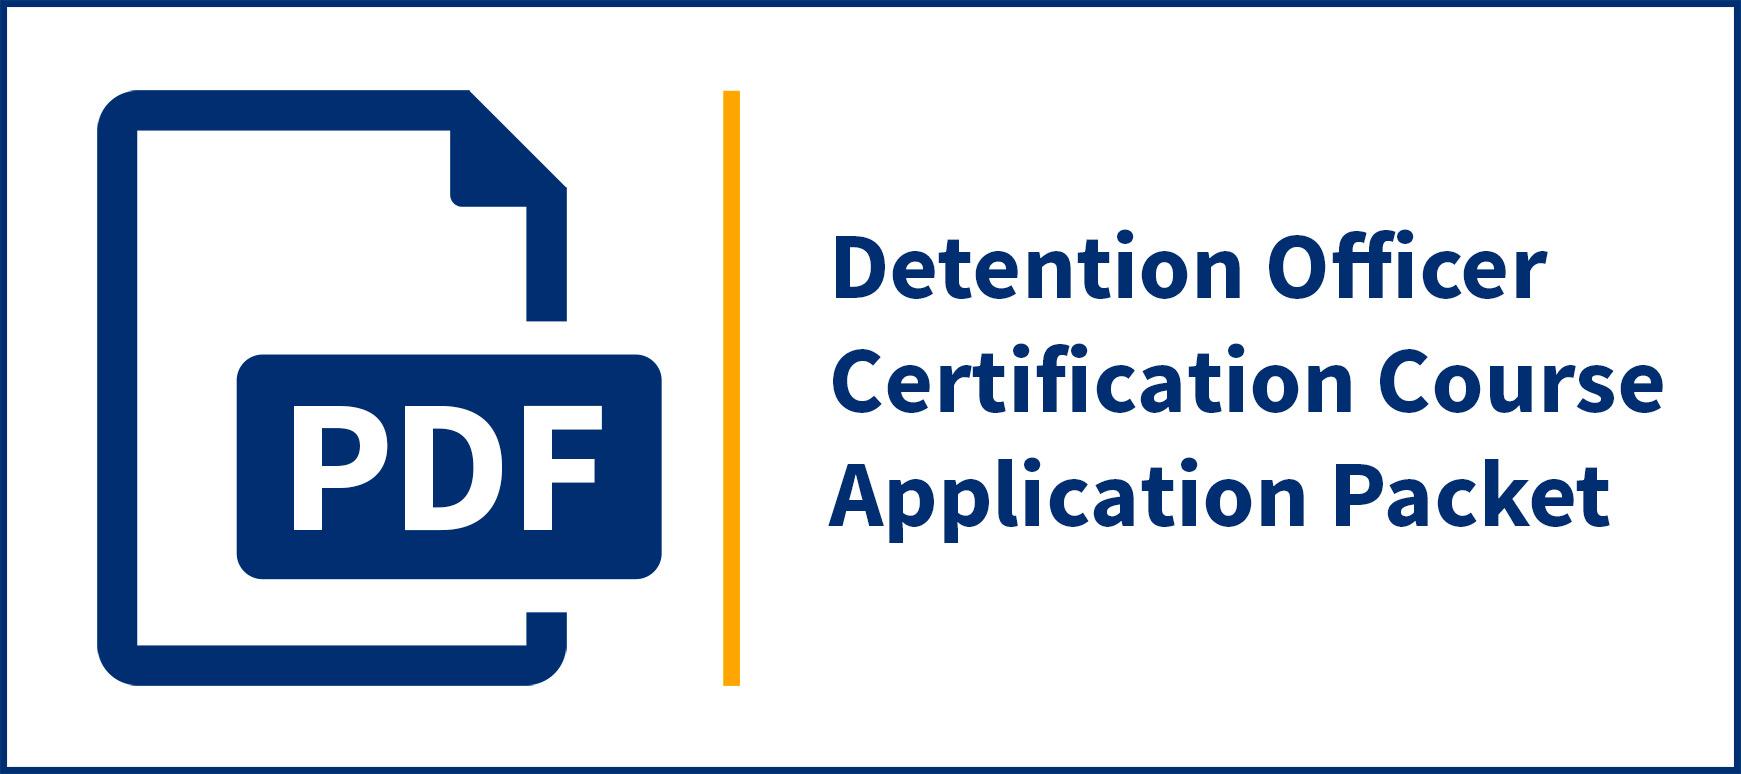 DOCC Application Packet